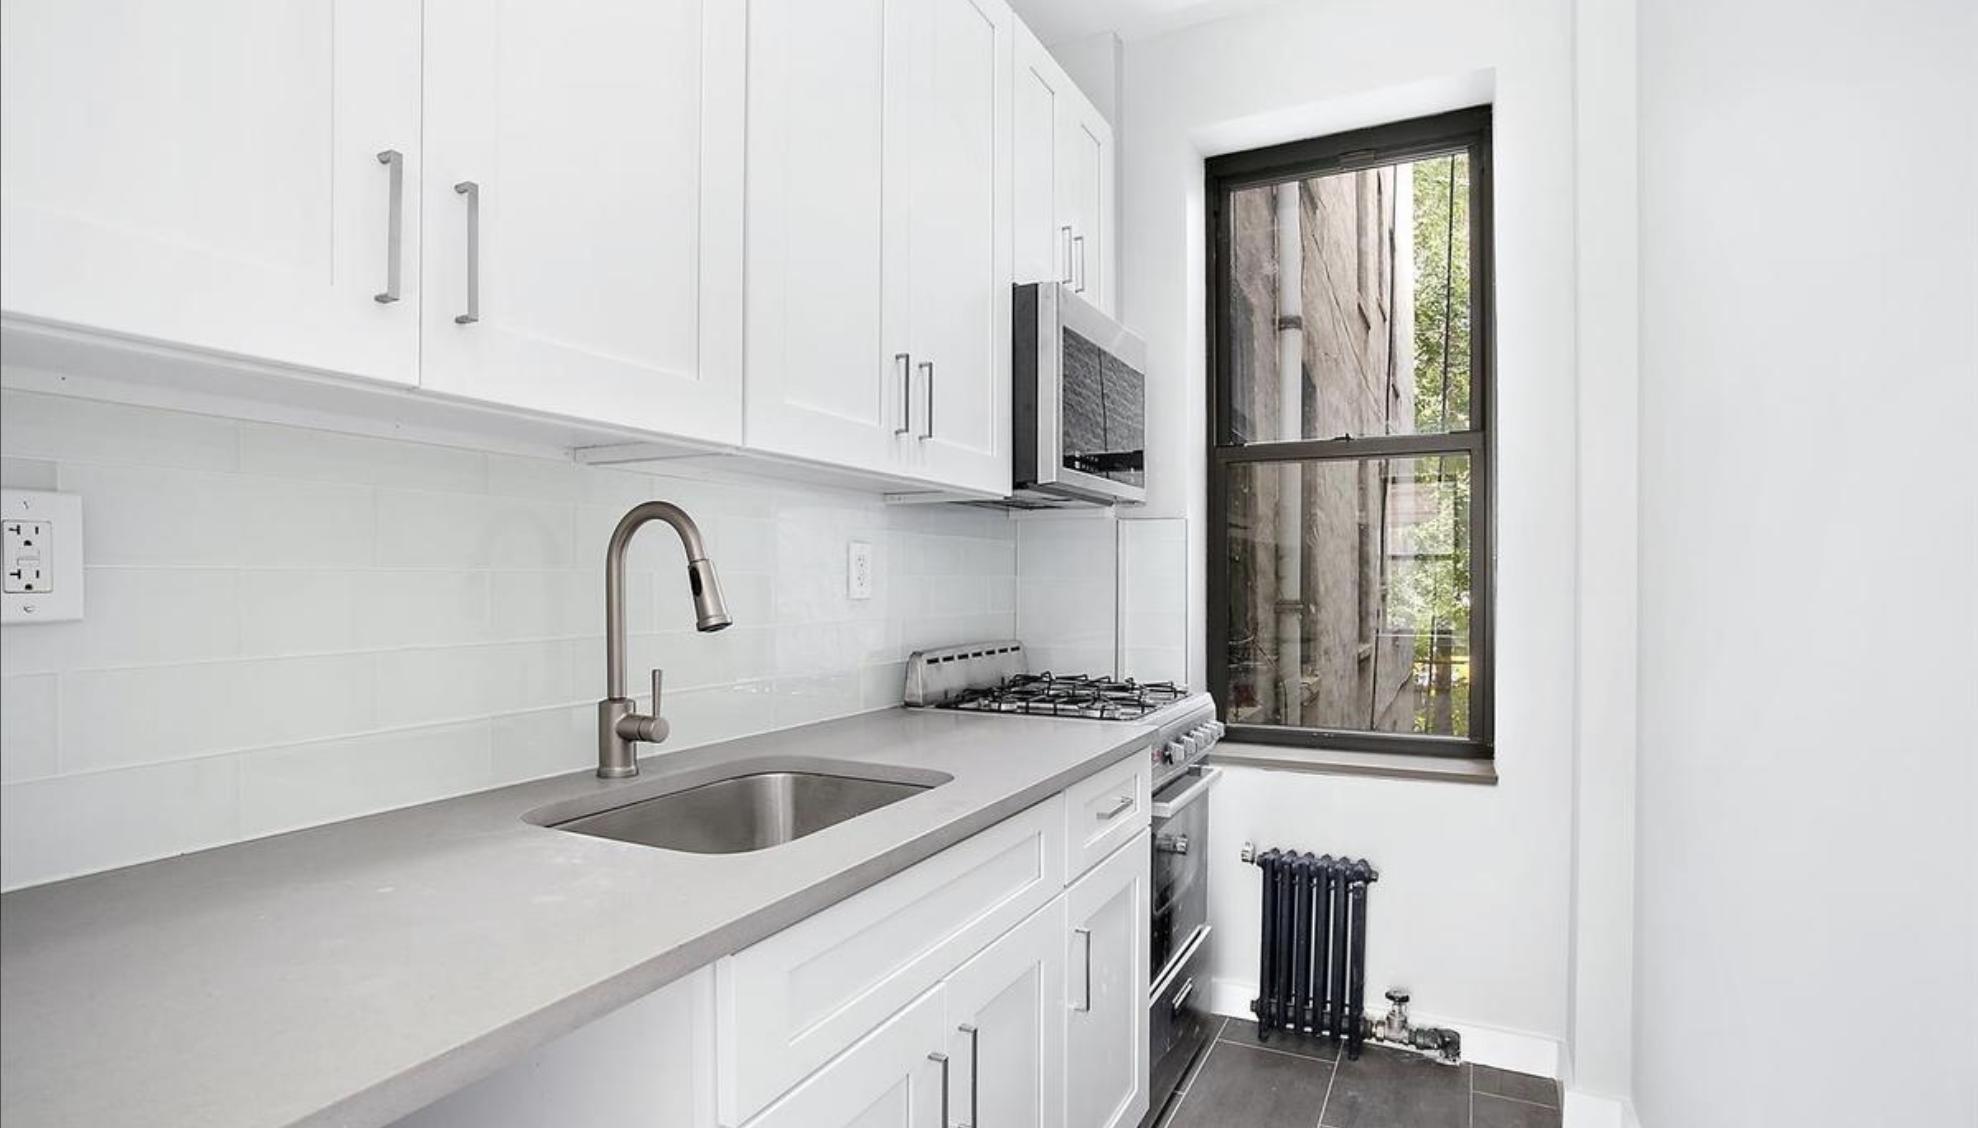 482 Tompkins Avenue 3D Kitchen .png